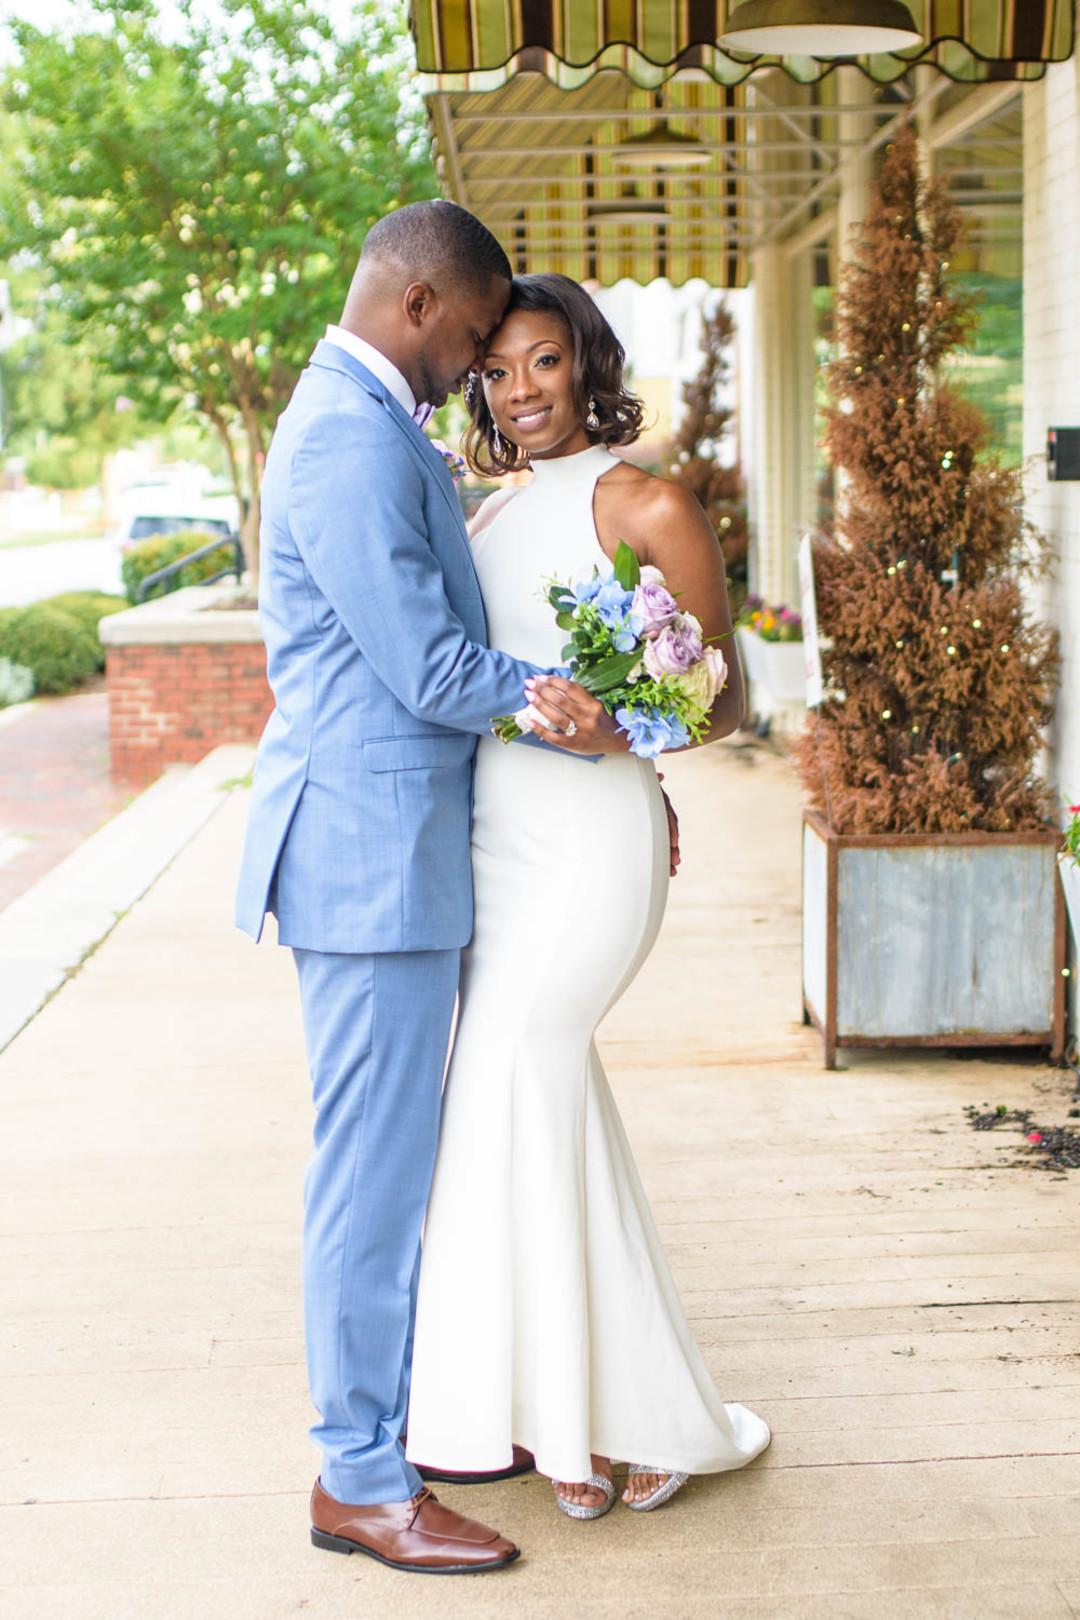 Curve enhancing bridal gown